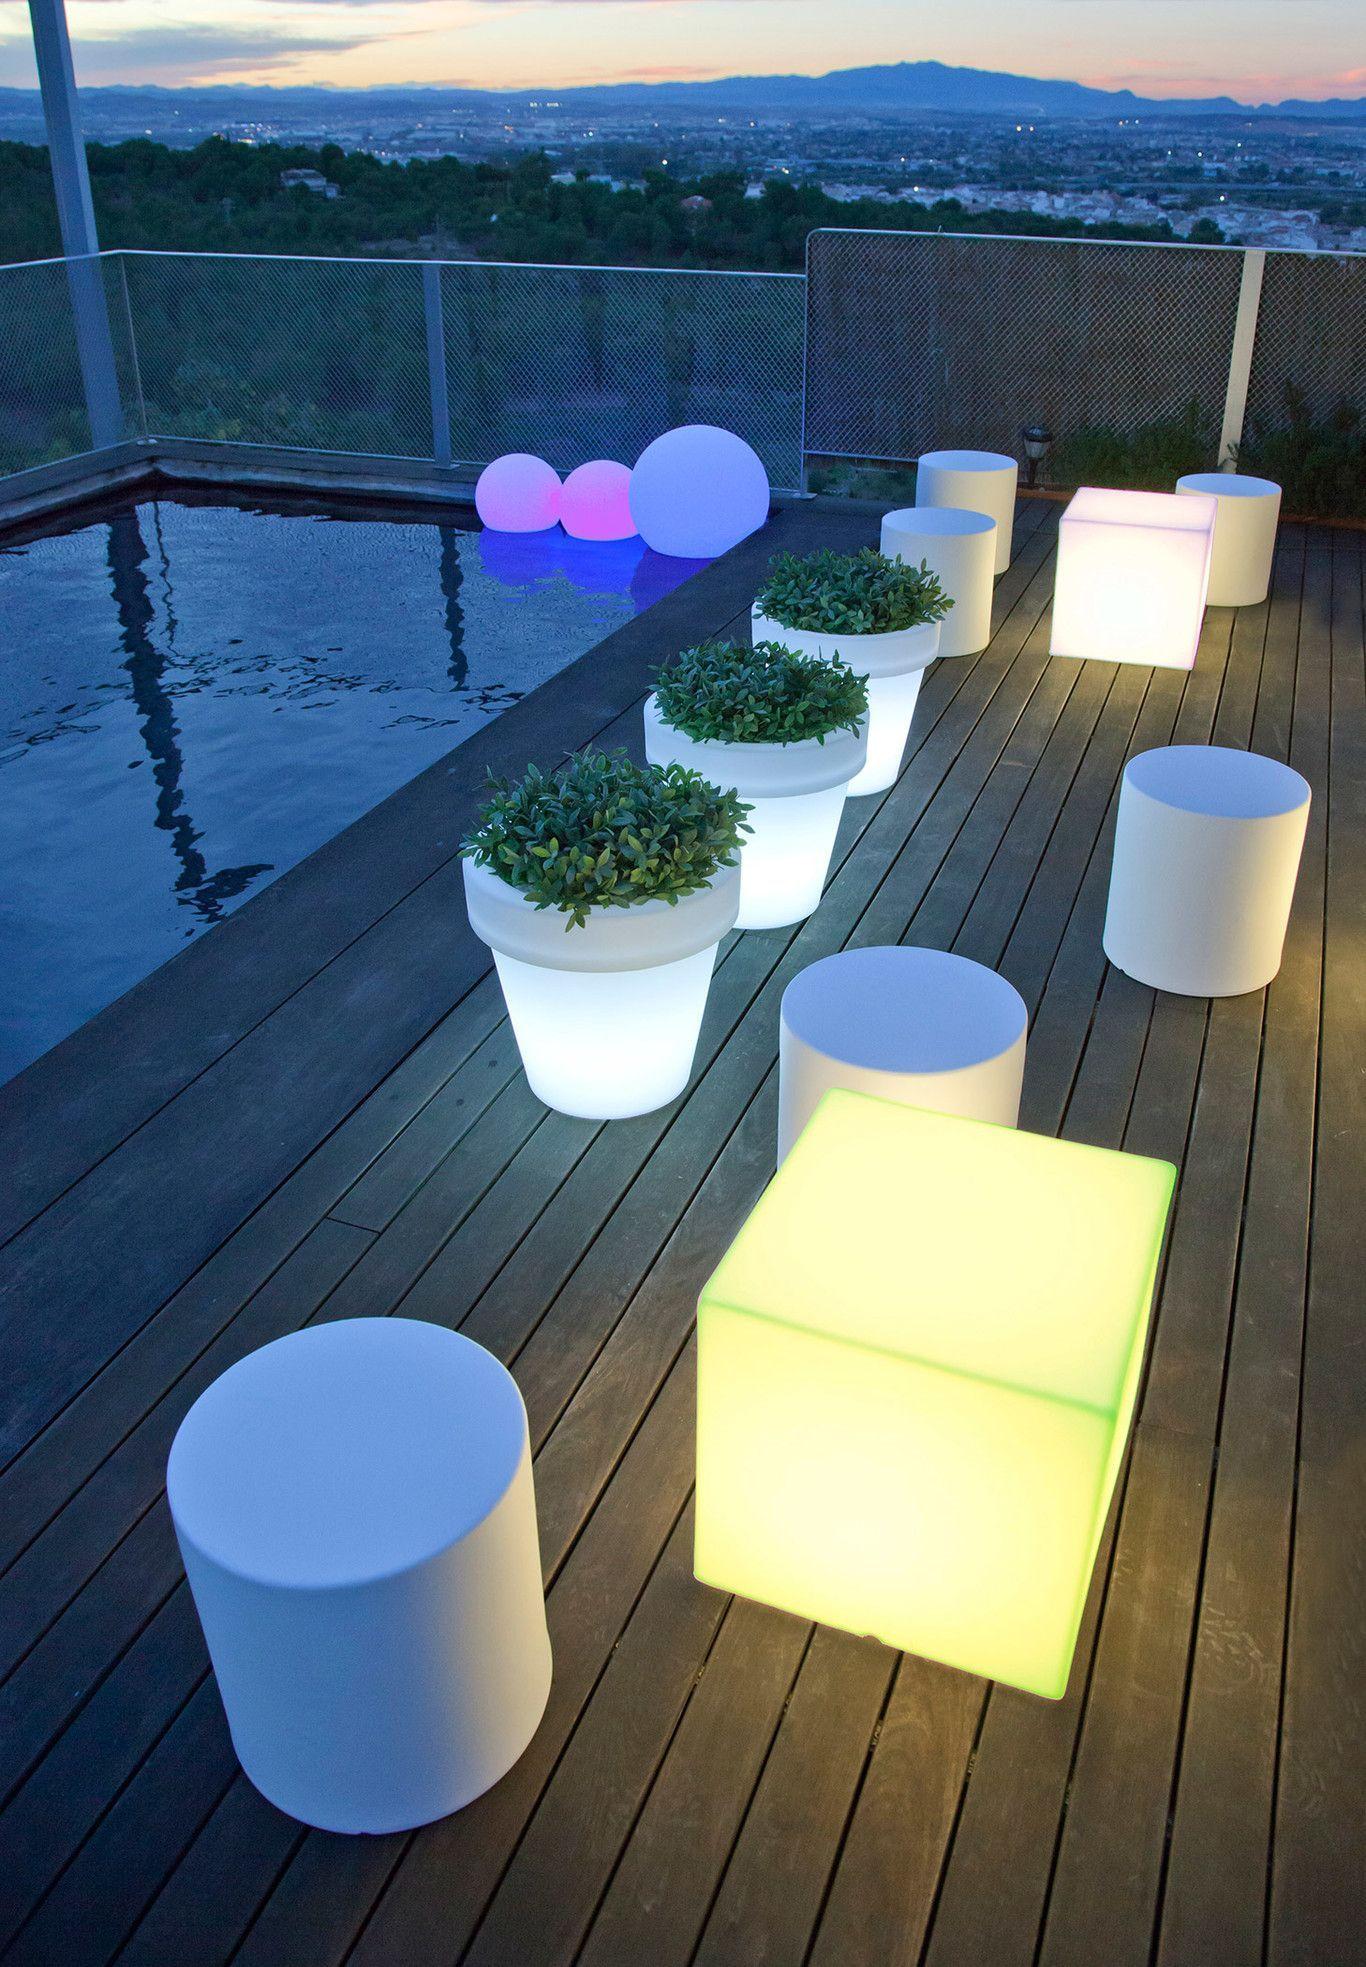 Lámparas inteligentes conexión wifi jardín